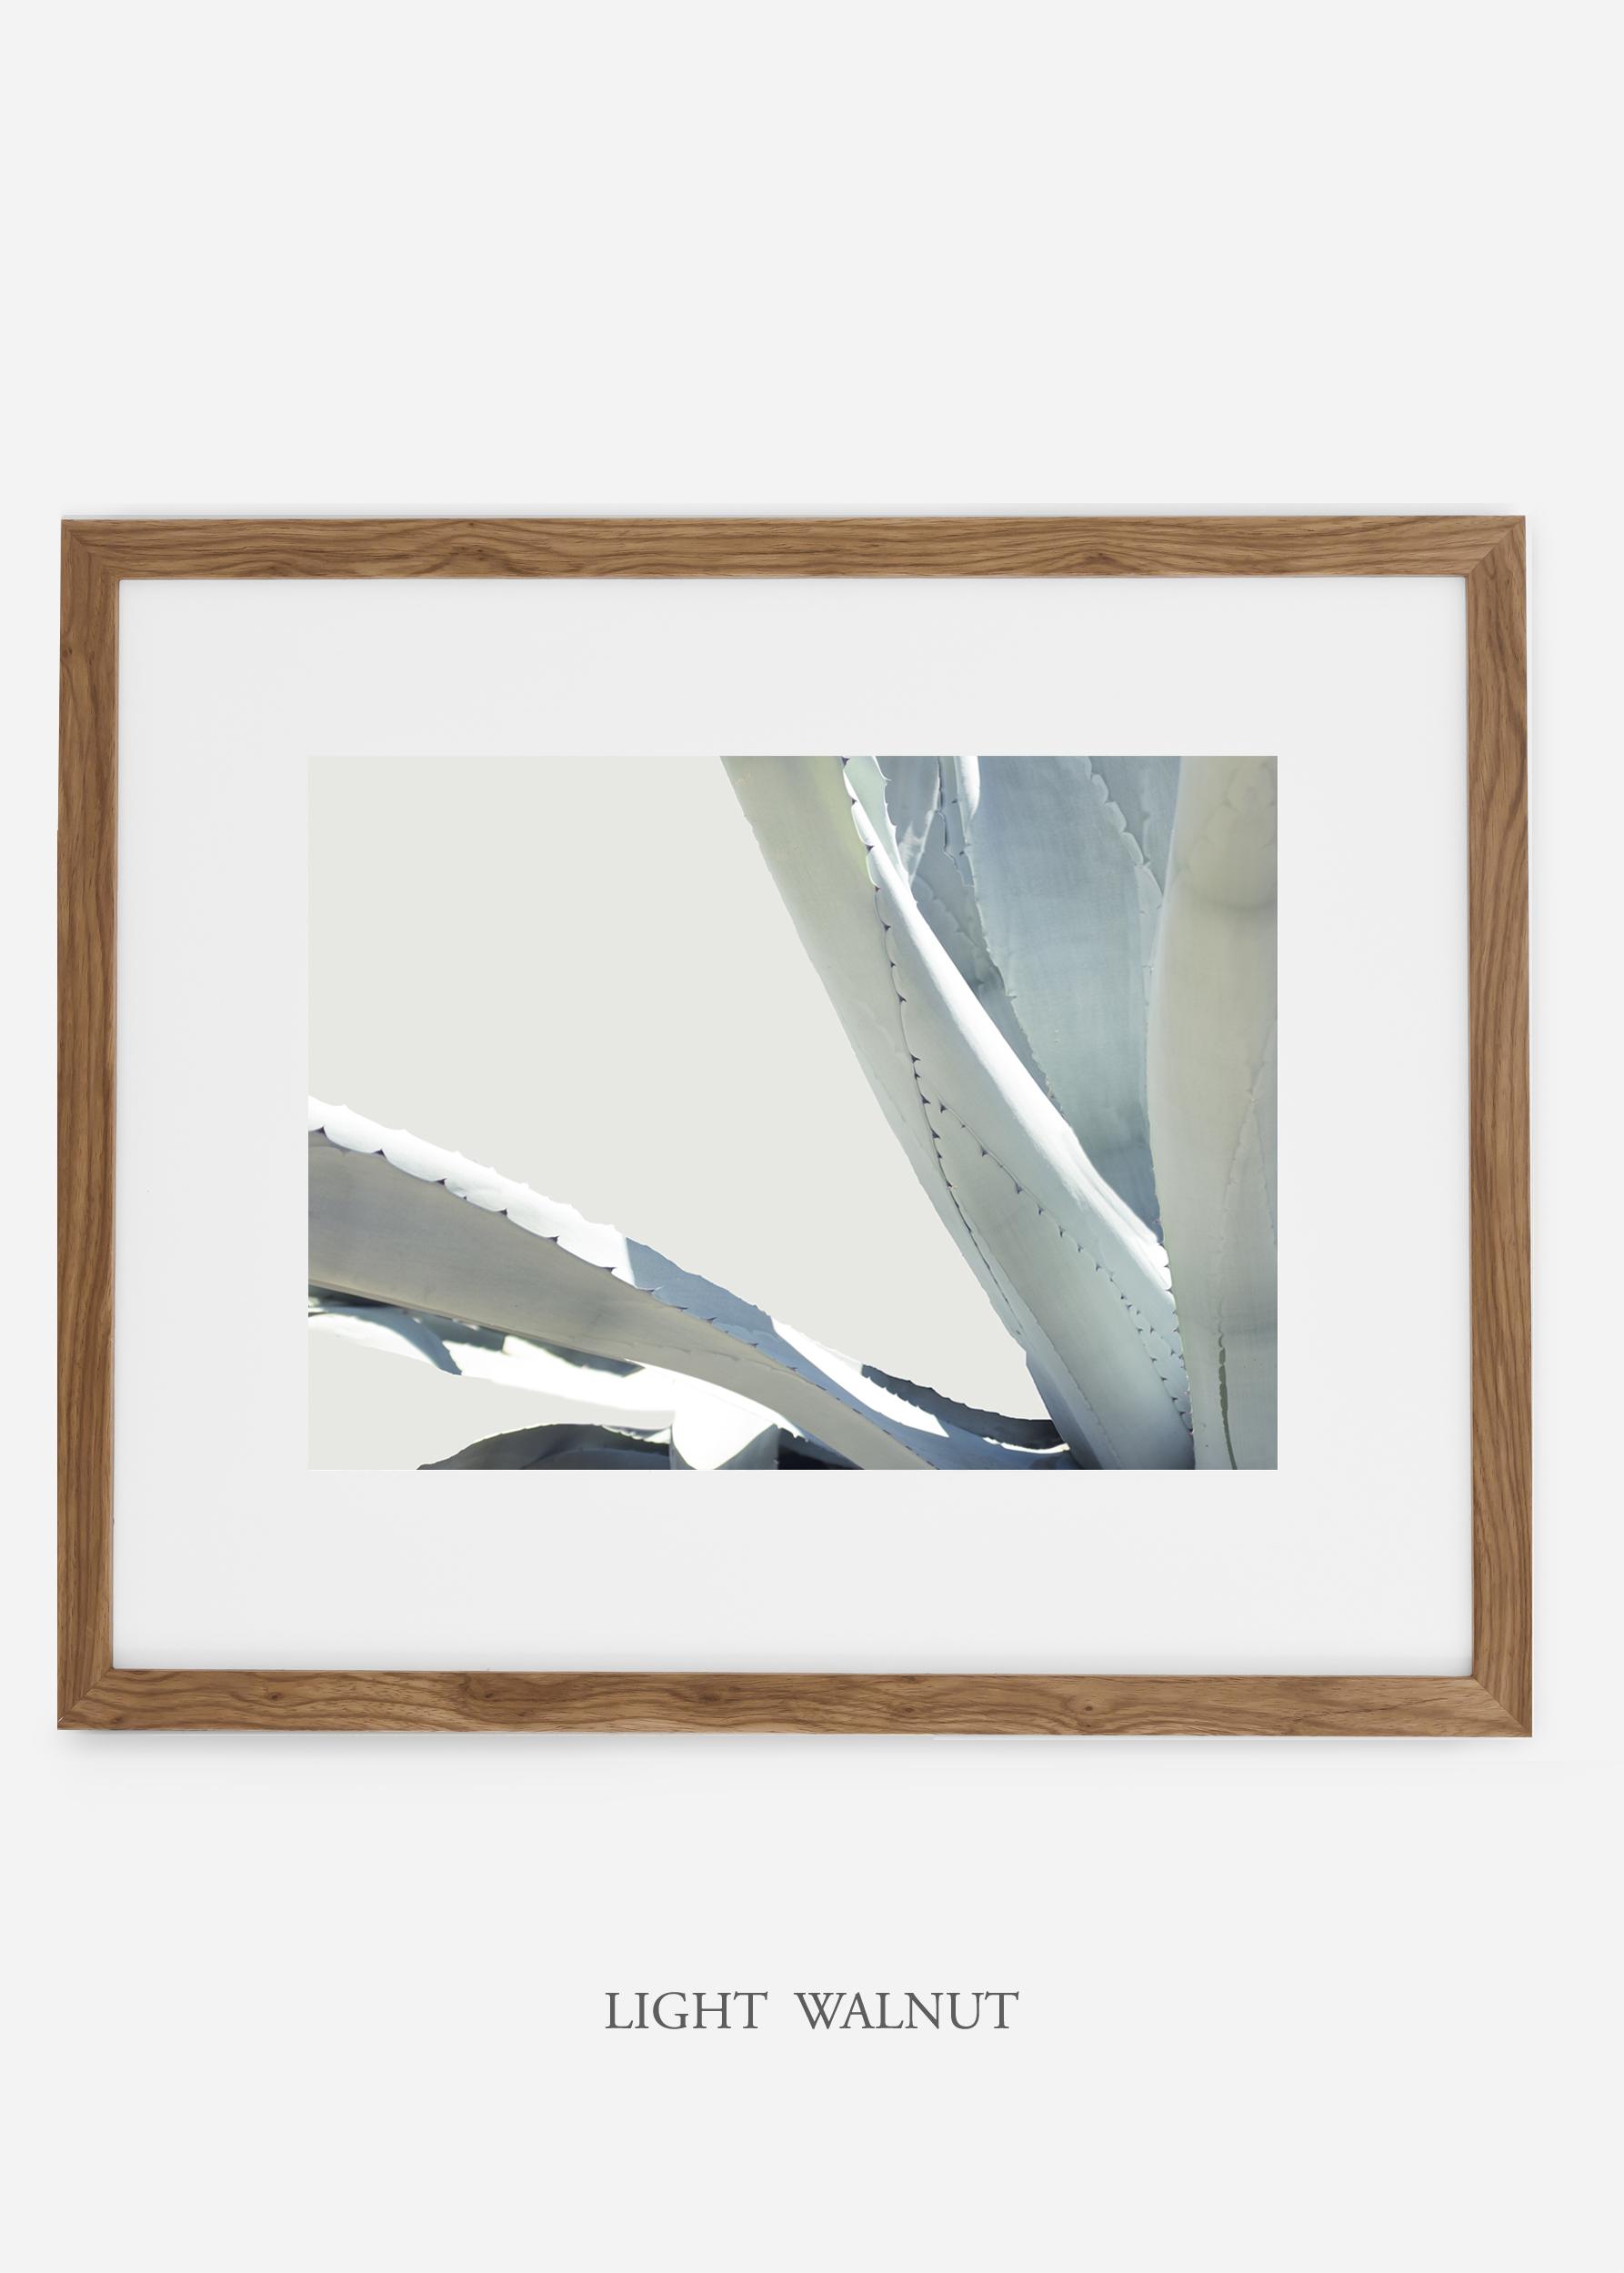 WilderCalifornia_lightwalnutframe_WinterWhite_No6_Art_Photography_interiordesign_agave.jpg